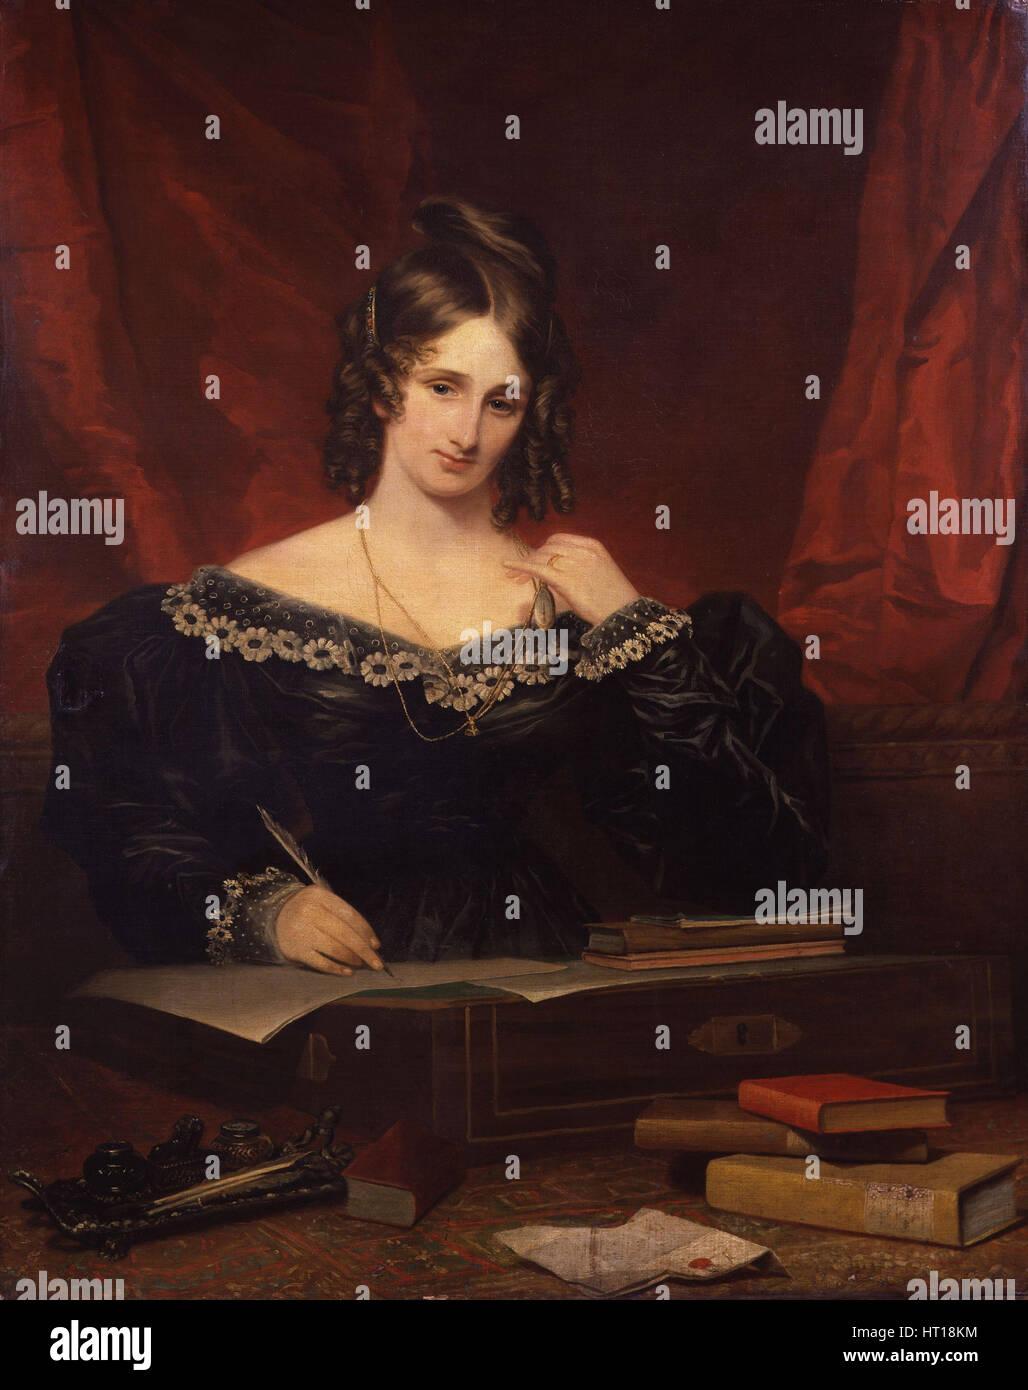 Mary Shelley, 1831. Artist: Stump, Samuel John (1778-1863) Stock Photo